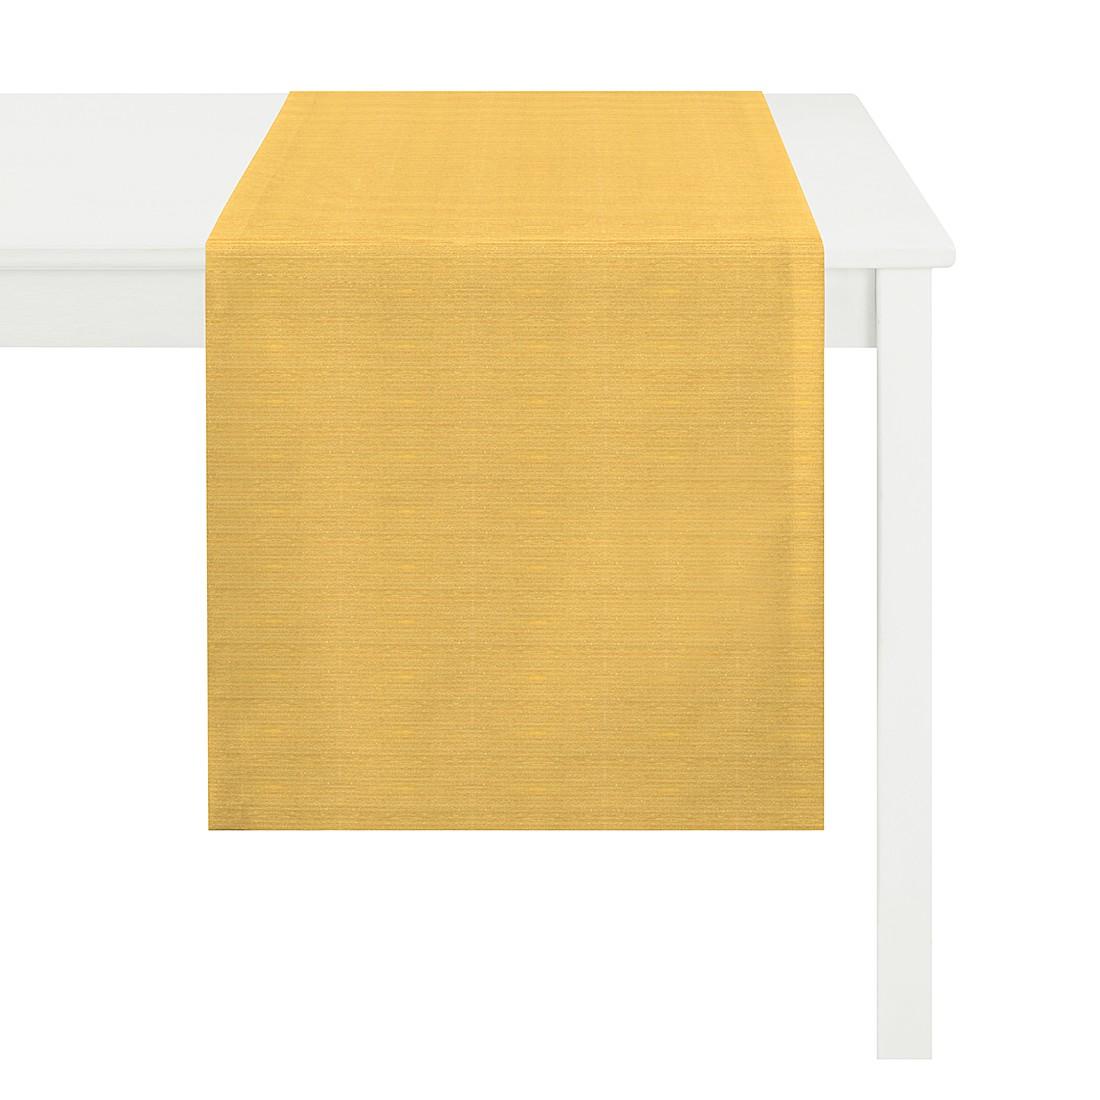 Tischläufer Tizian – Gelb, Apelt günstig